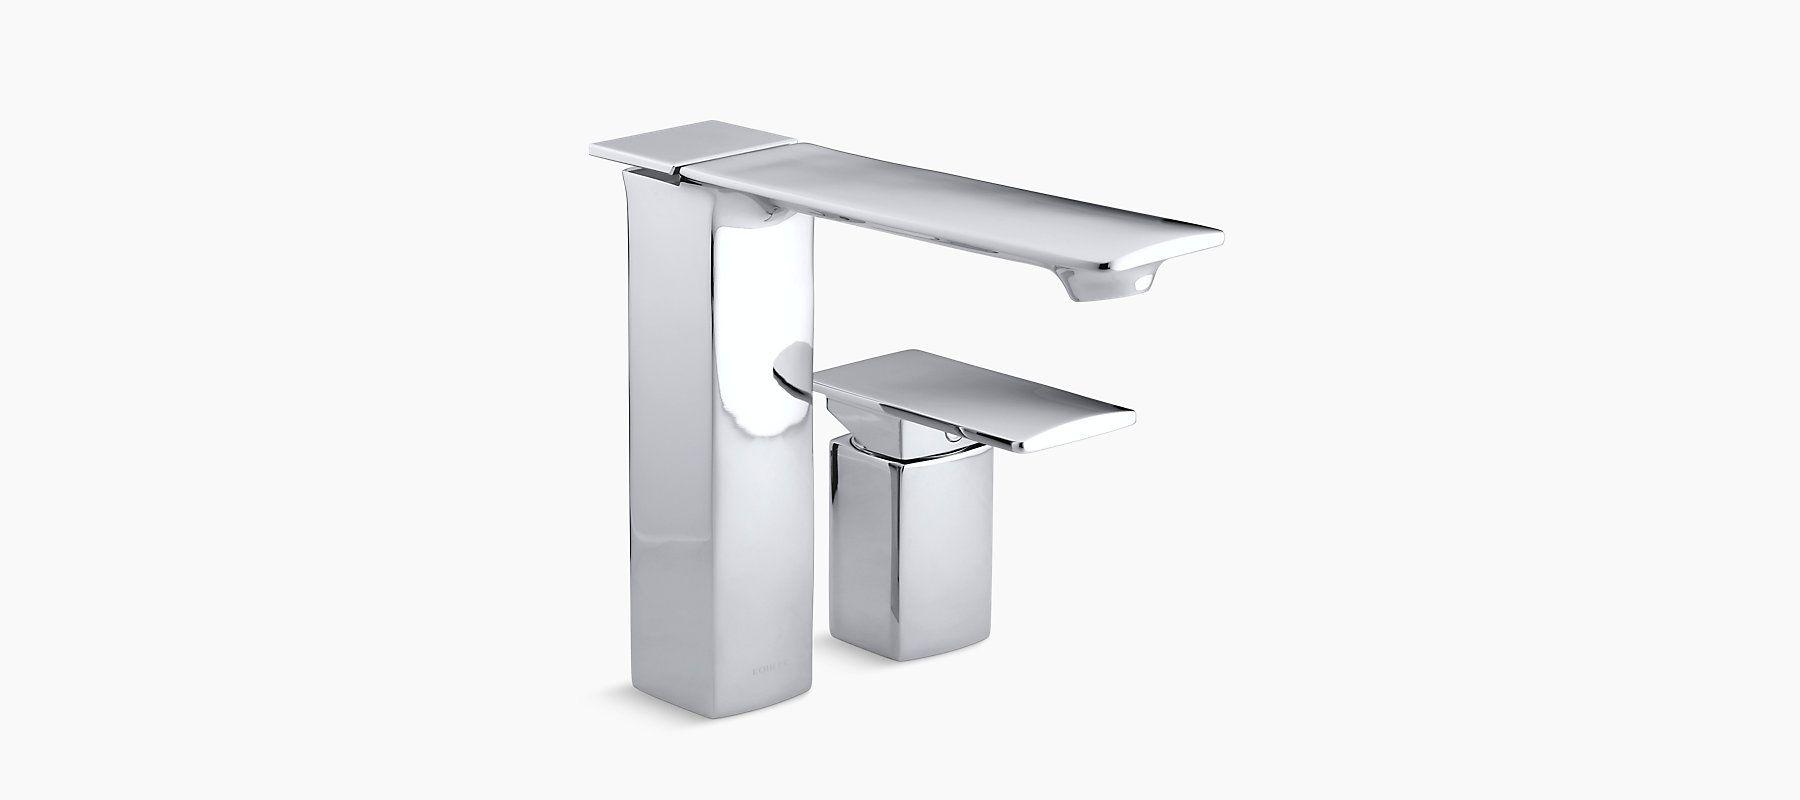 Buy Kohler Stance Deck Mount Sc Bath Faucet With Handshower K 14774in 4 Cp Online At Low Price